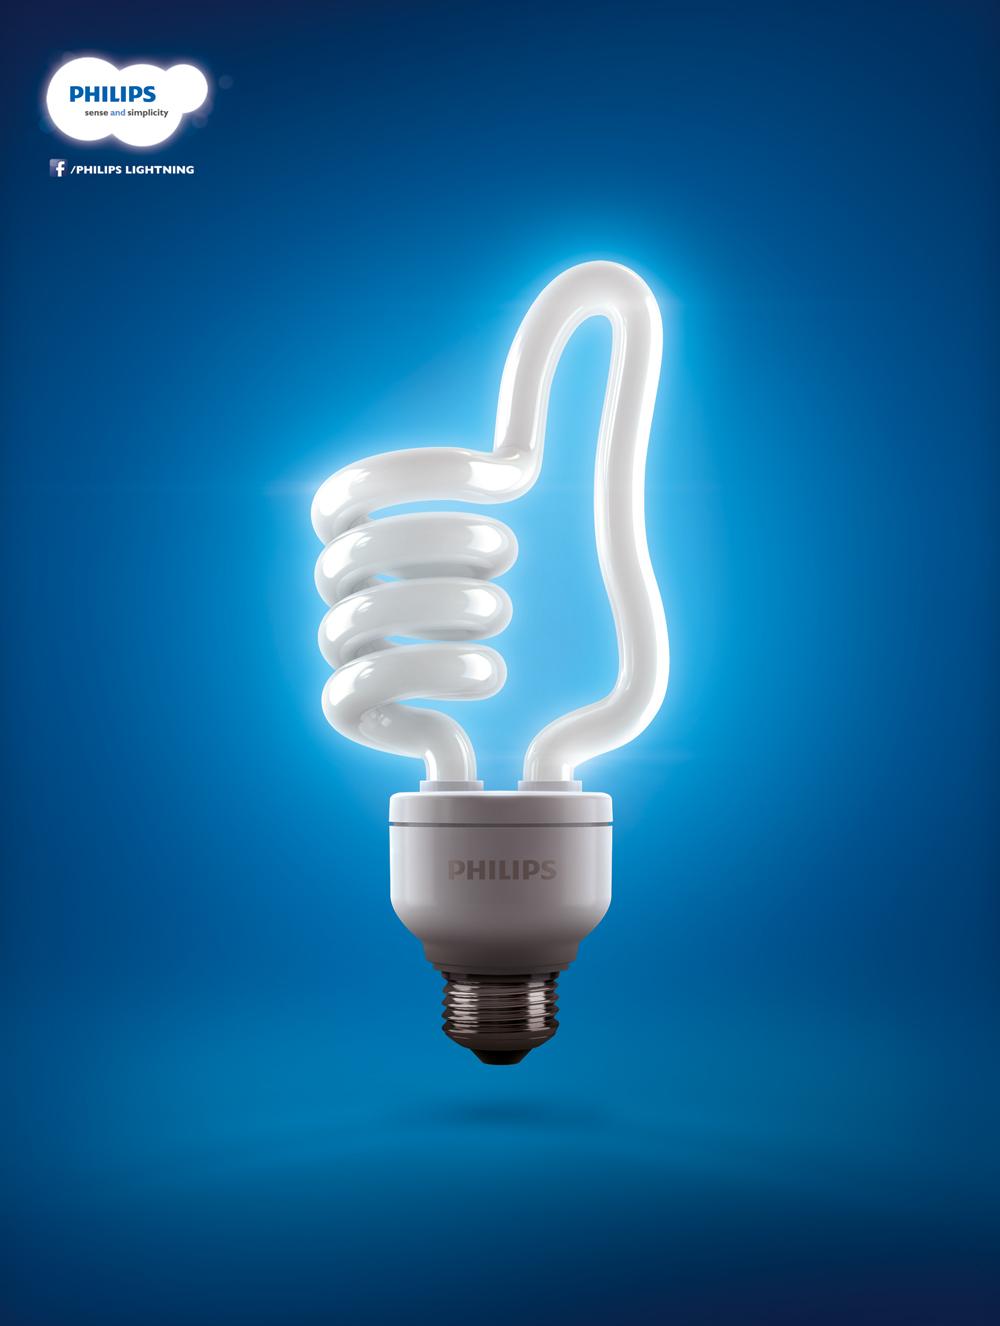 Philips Lights You on Behance